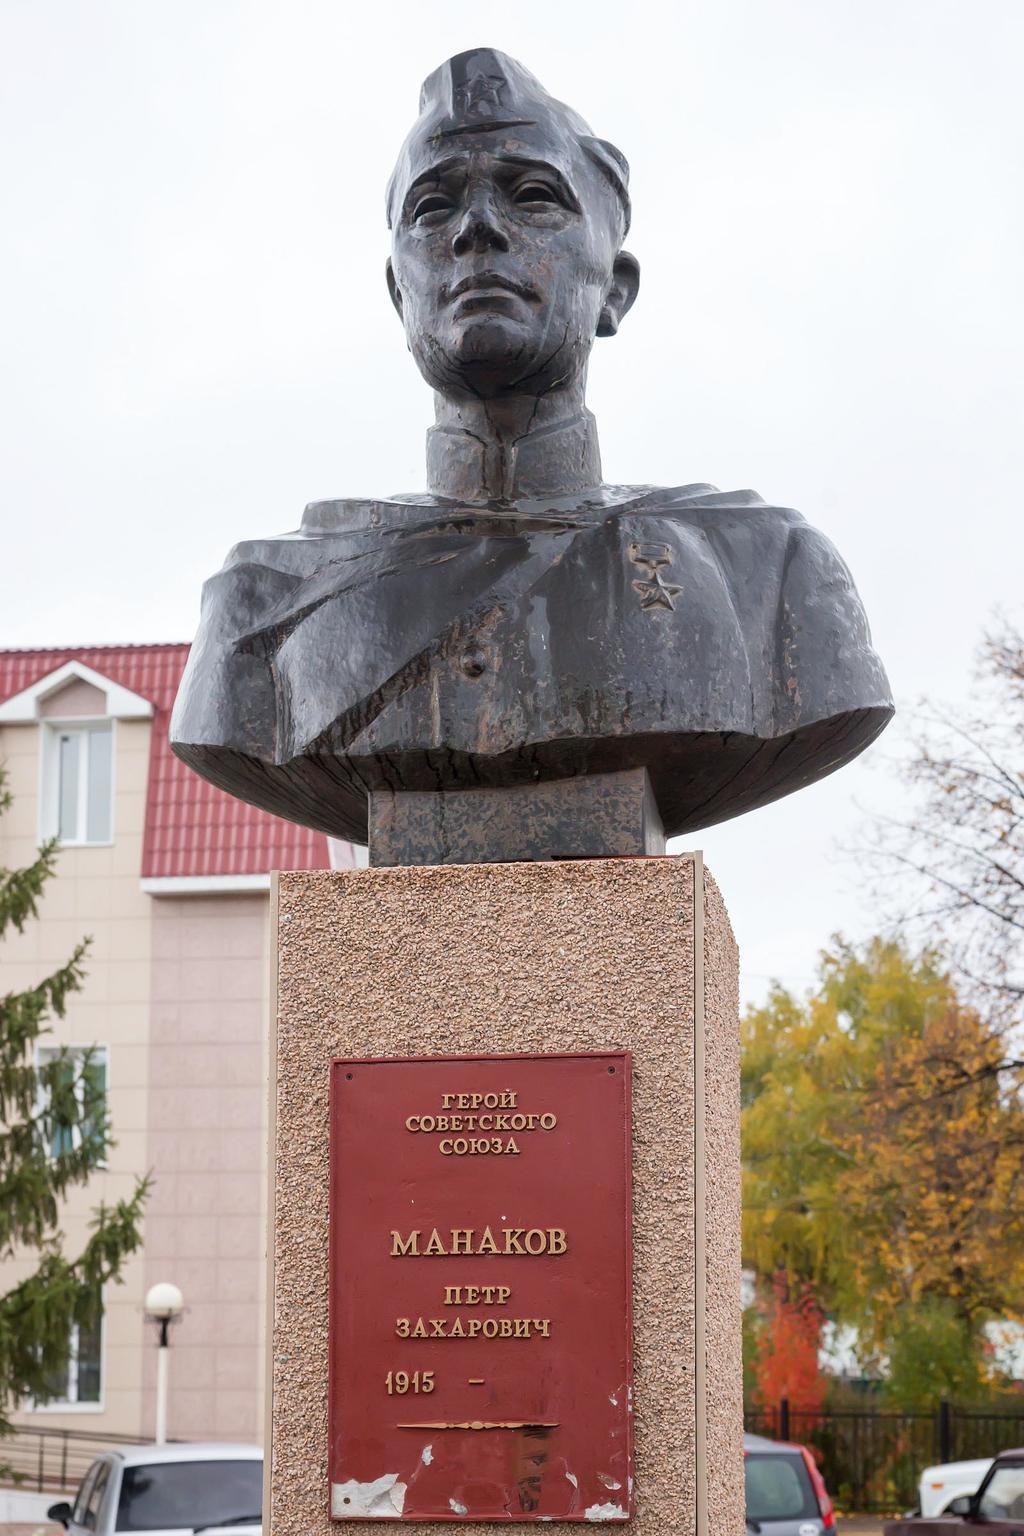 Манаков Петр Захарович 1915, Герой Советского Союза ©Tatfrontu.ru Photo Archive